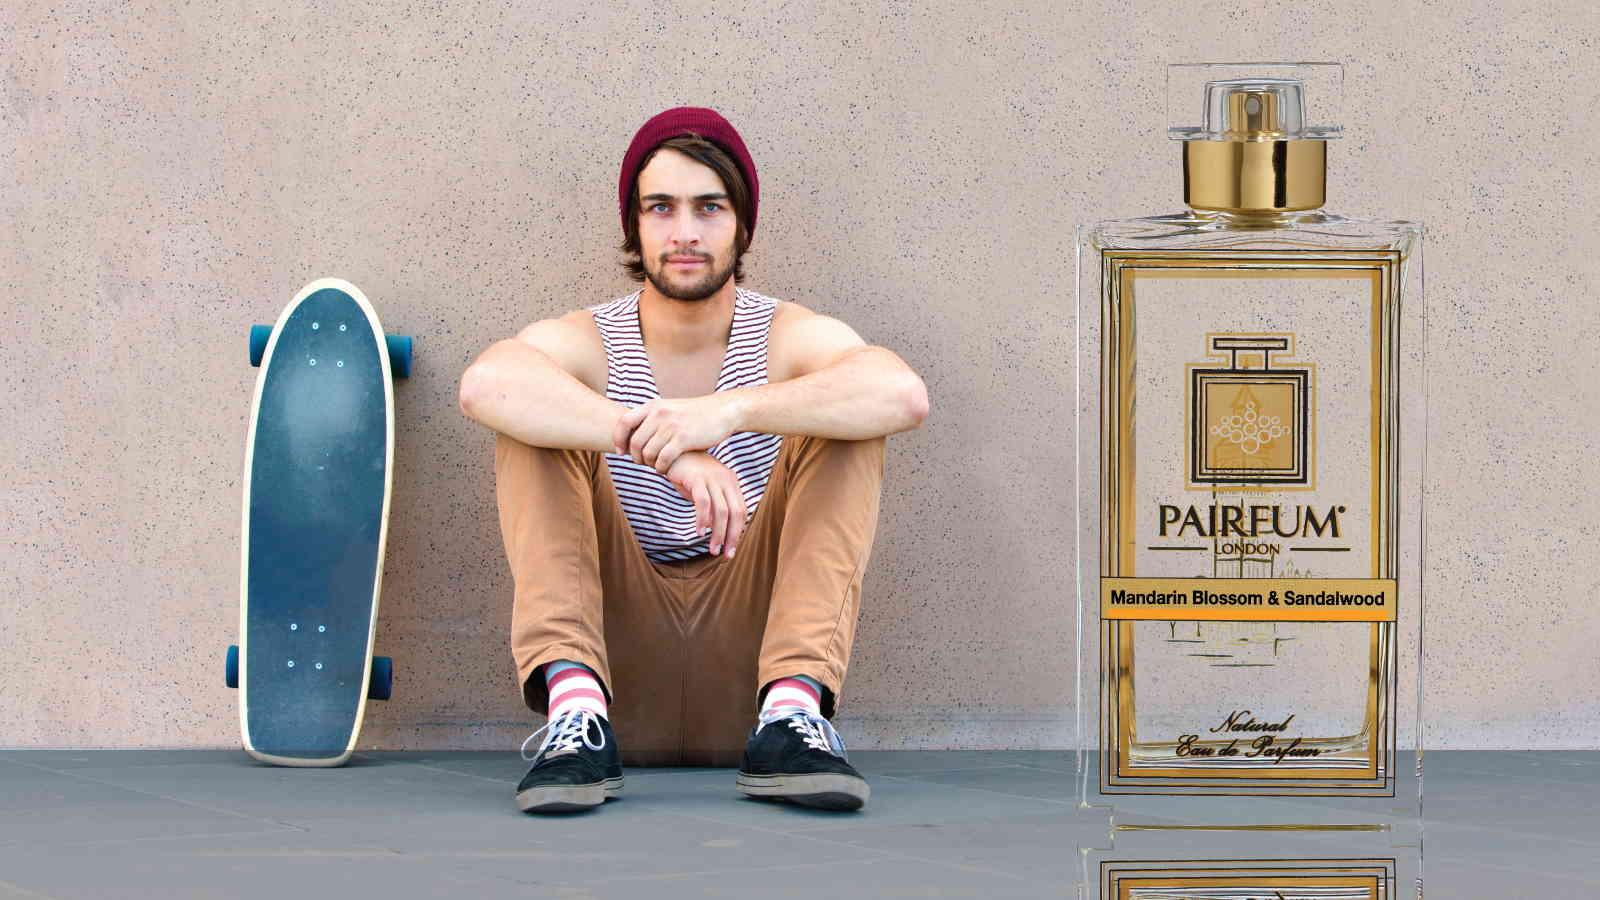 Eau De Parfum Person Reflection Mandarin Blossom Sandalwood Scateboard 16 9